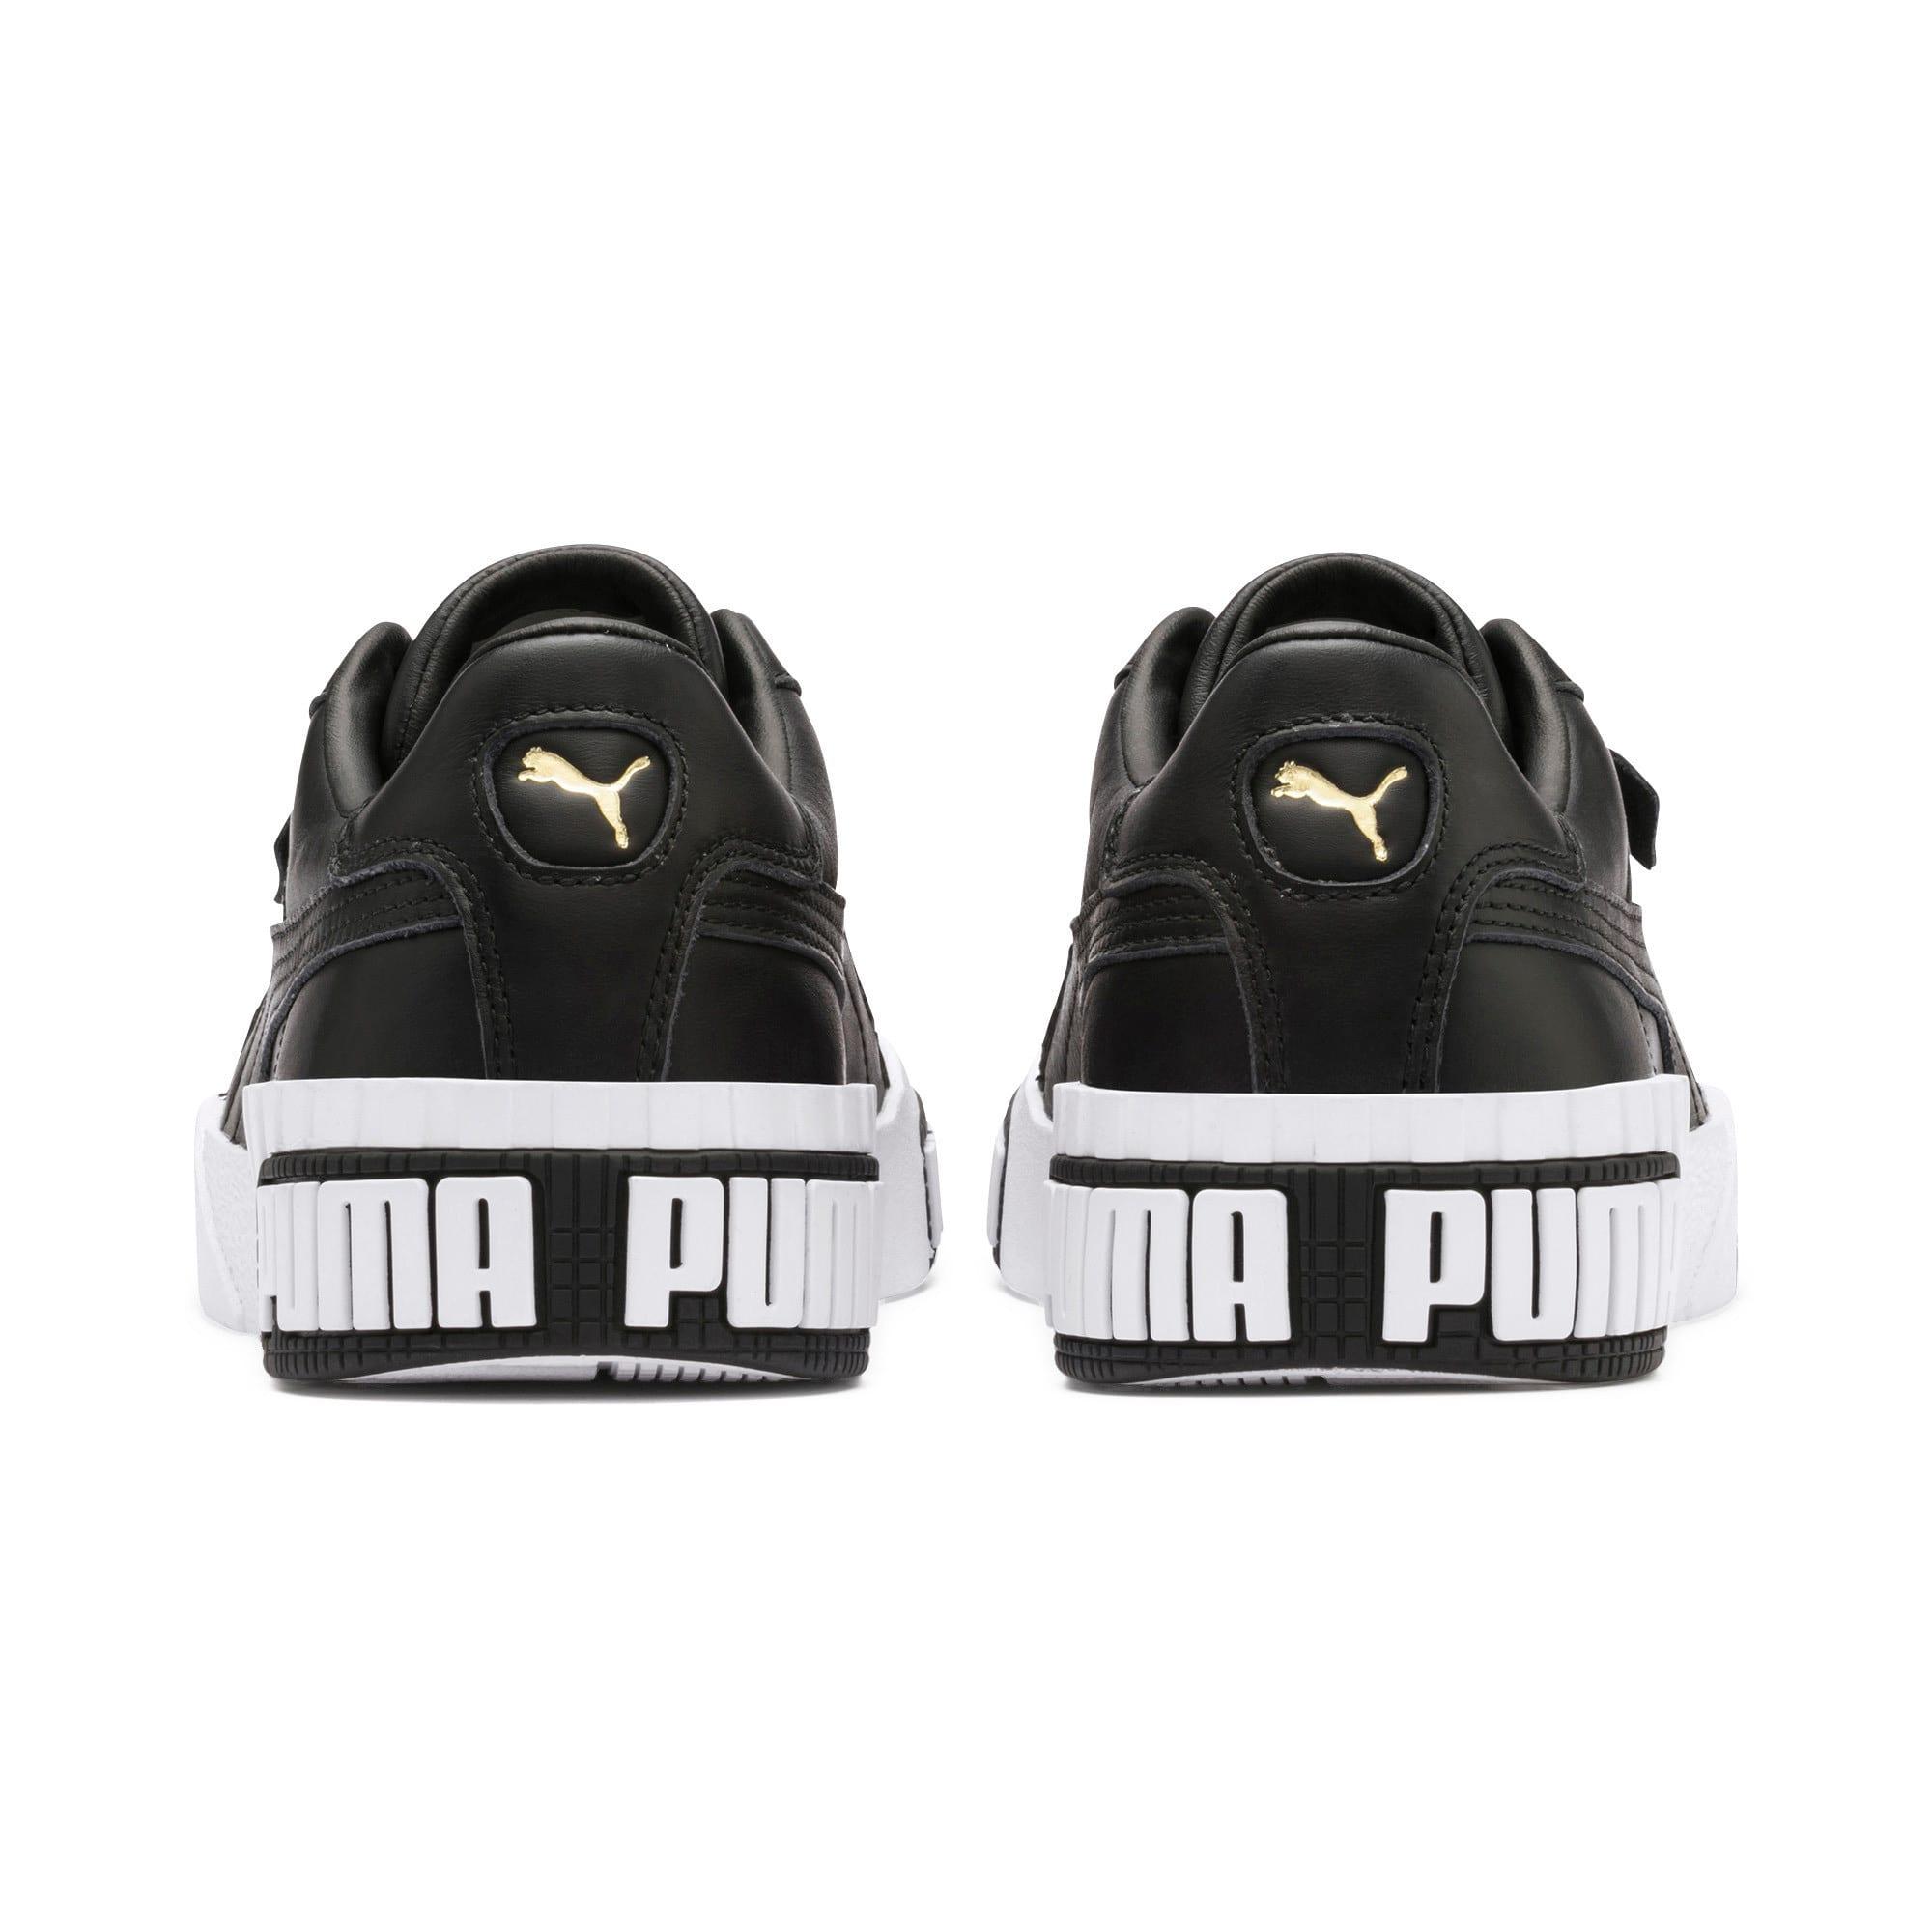 Thumbnail 4 of Cali Bold Women's Sneakers, Puma Black-Metallic Gold, medium